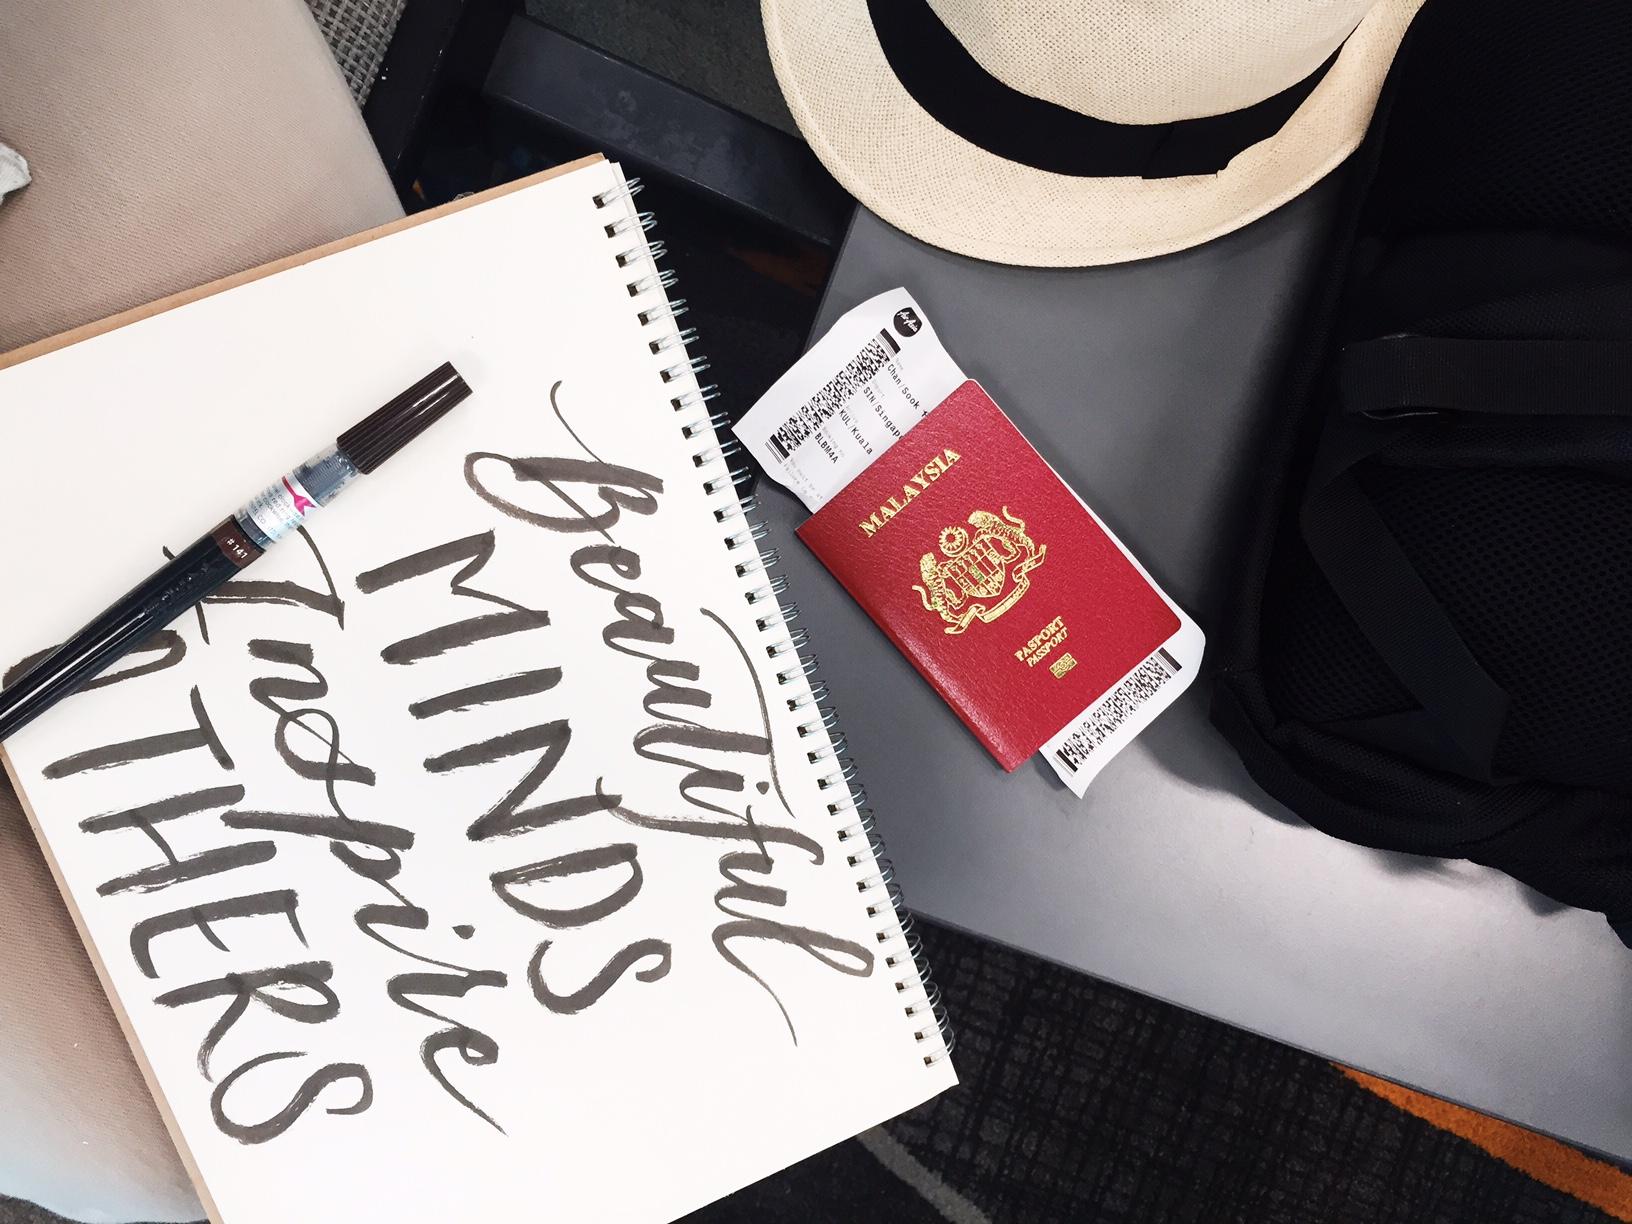 Preparing the drafts in airport